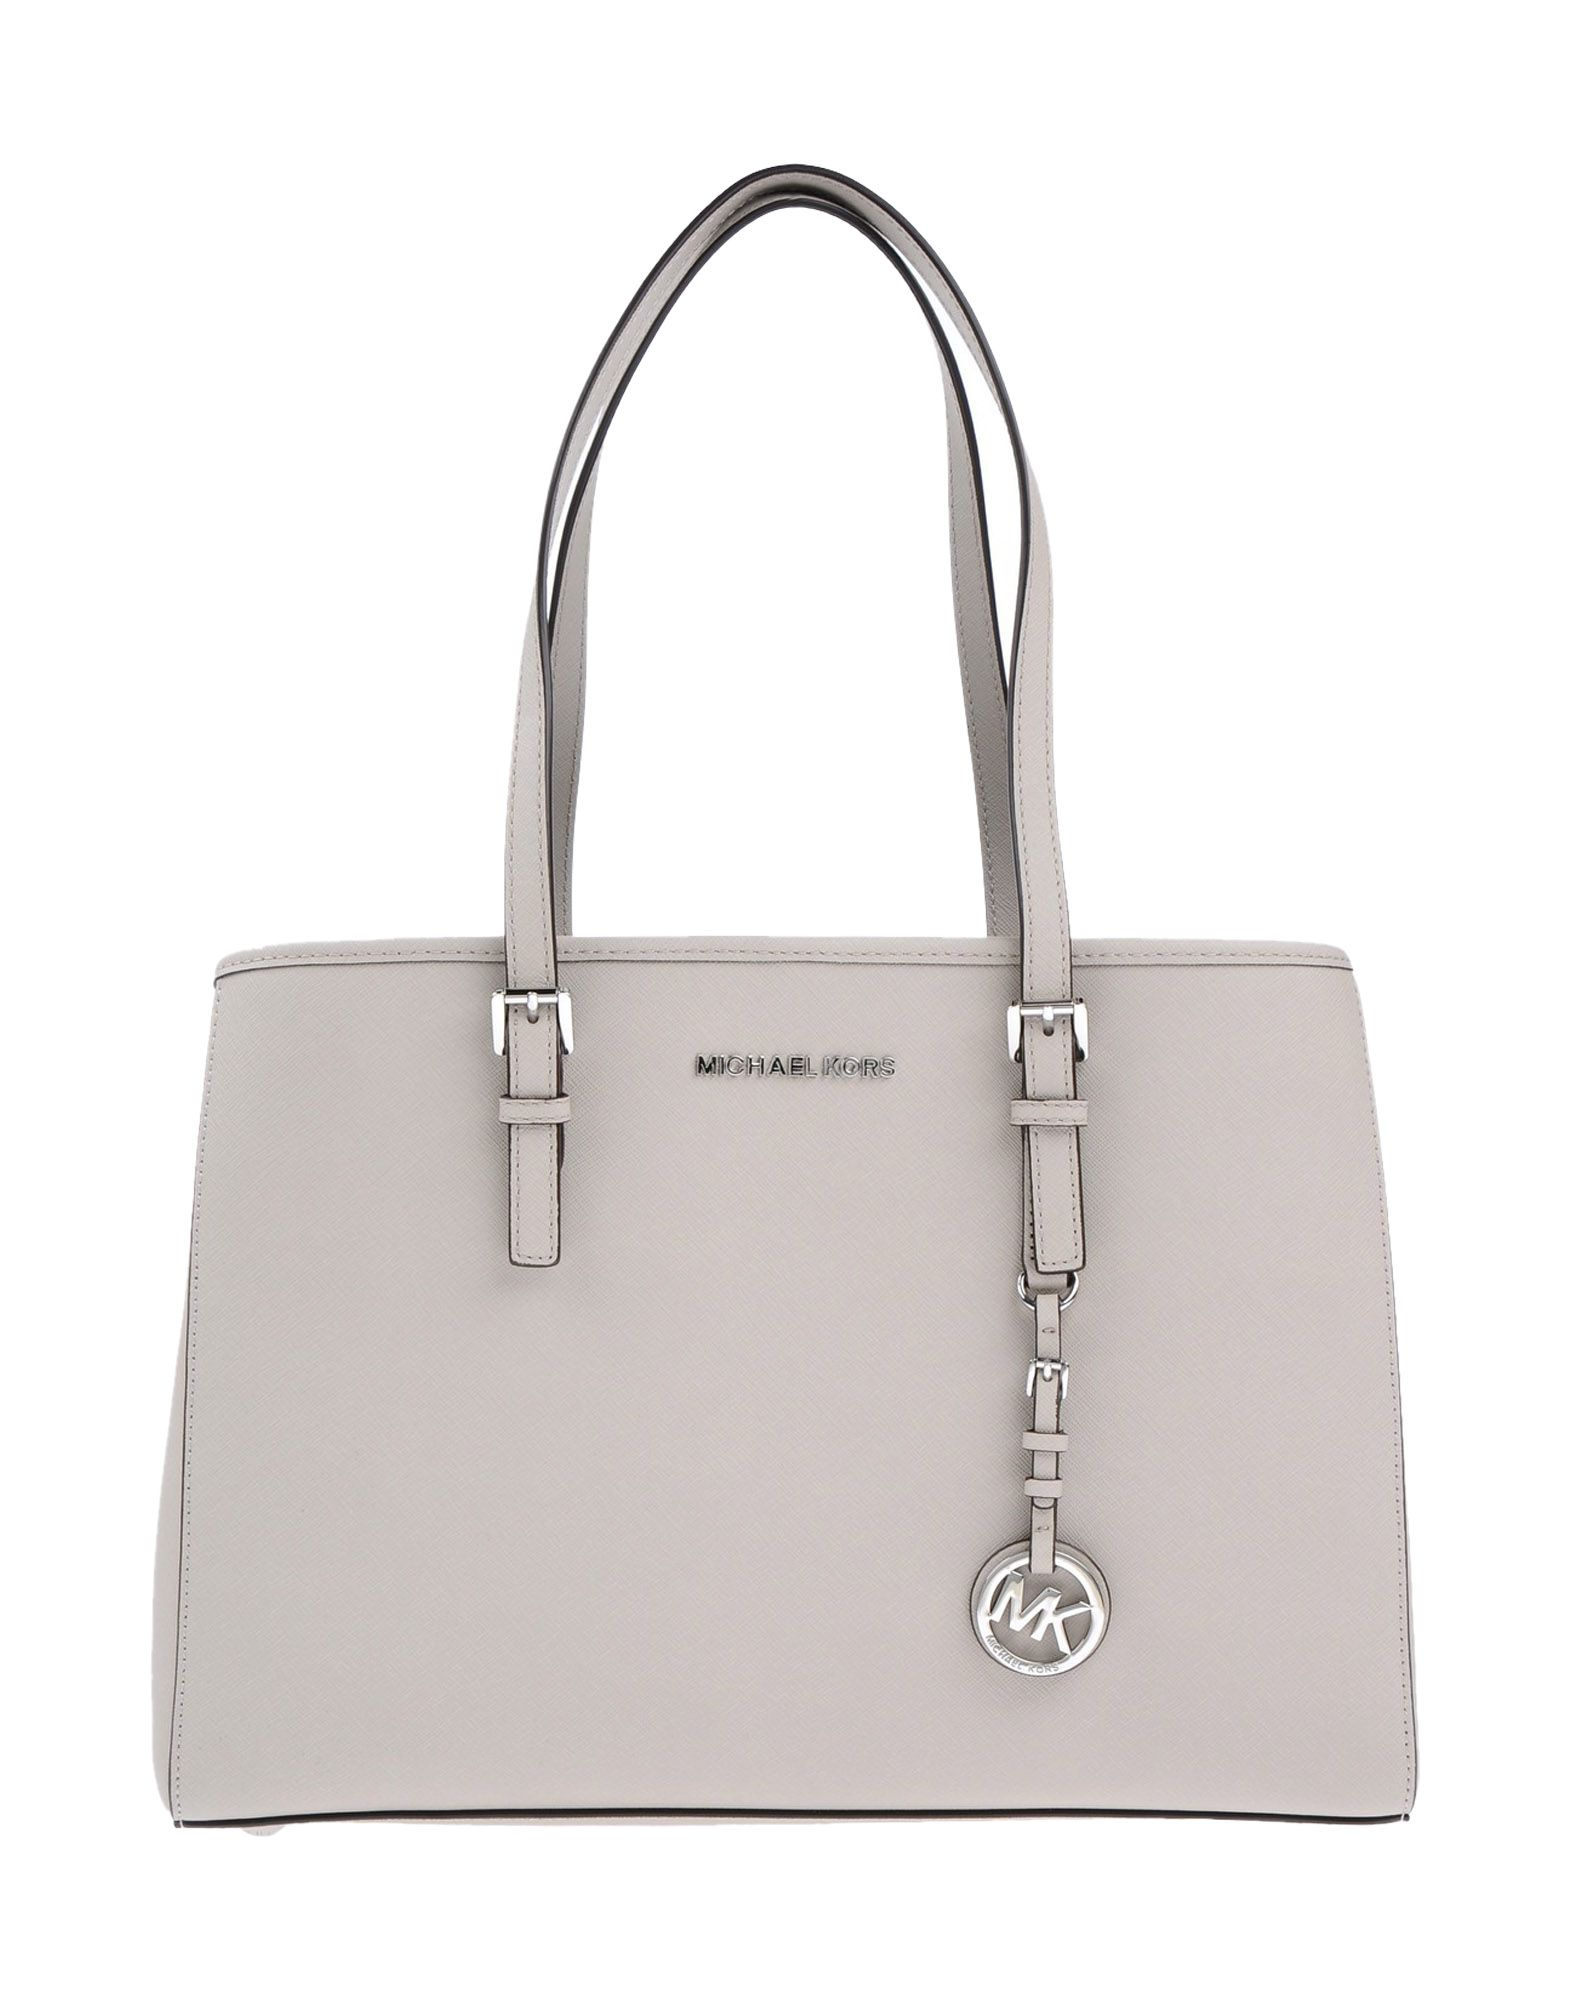 Michael Kors Handbags Light Grey